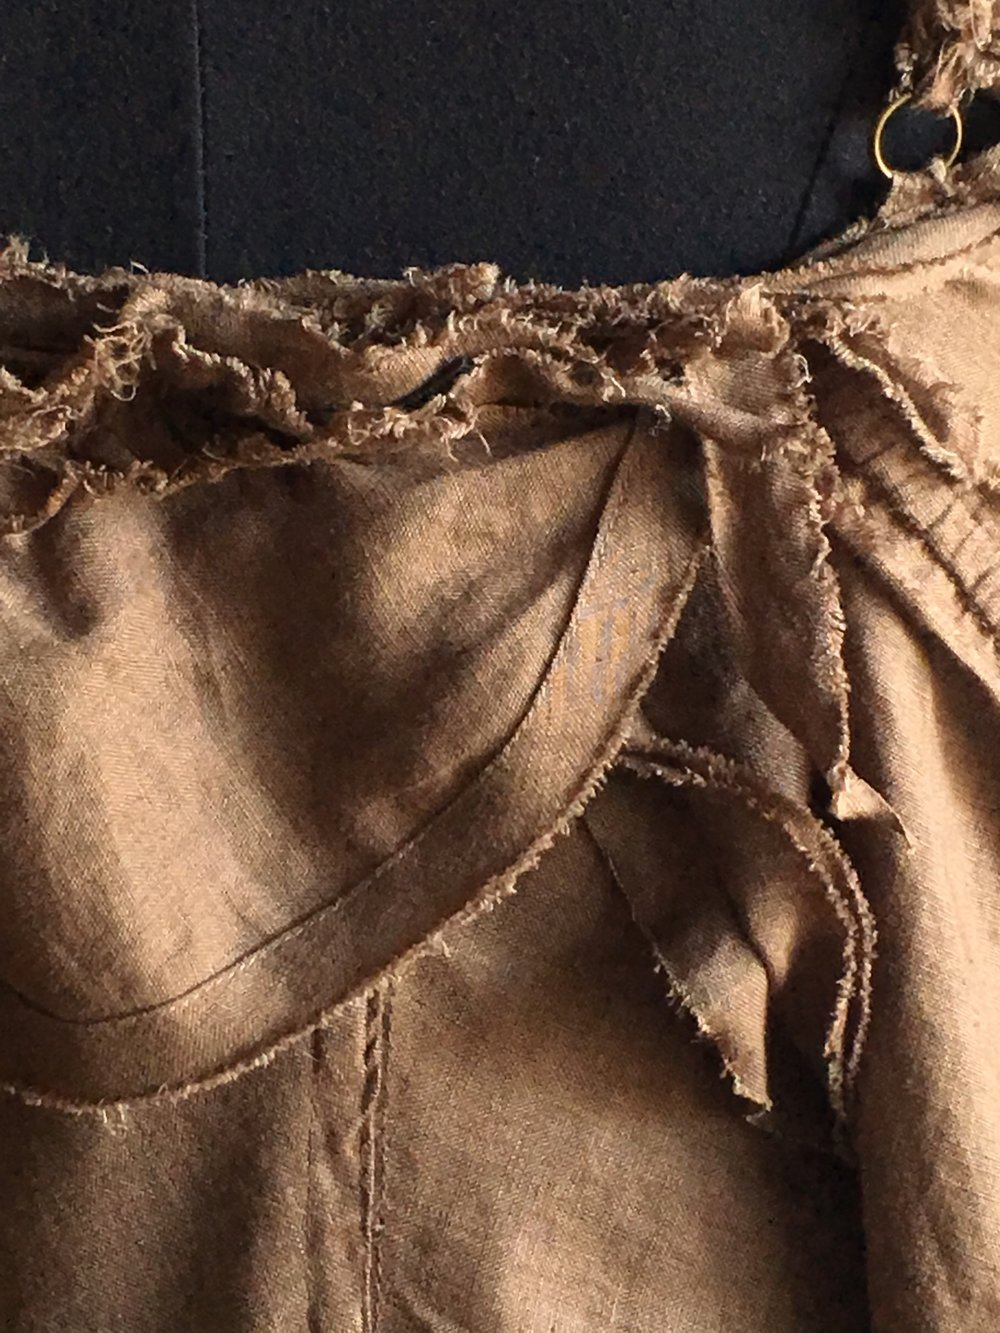 front ruffle close-up brown dress.jpg